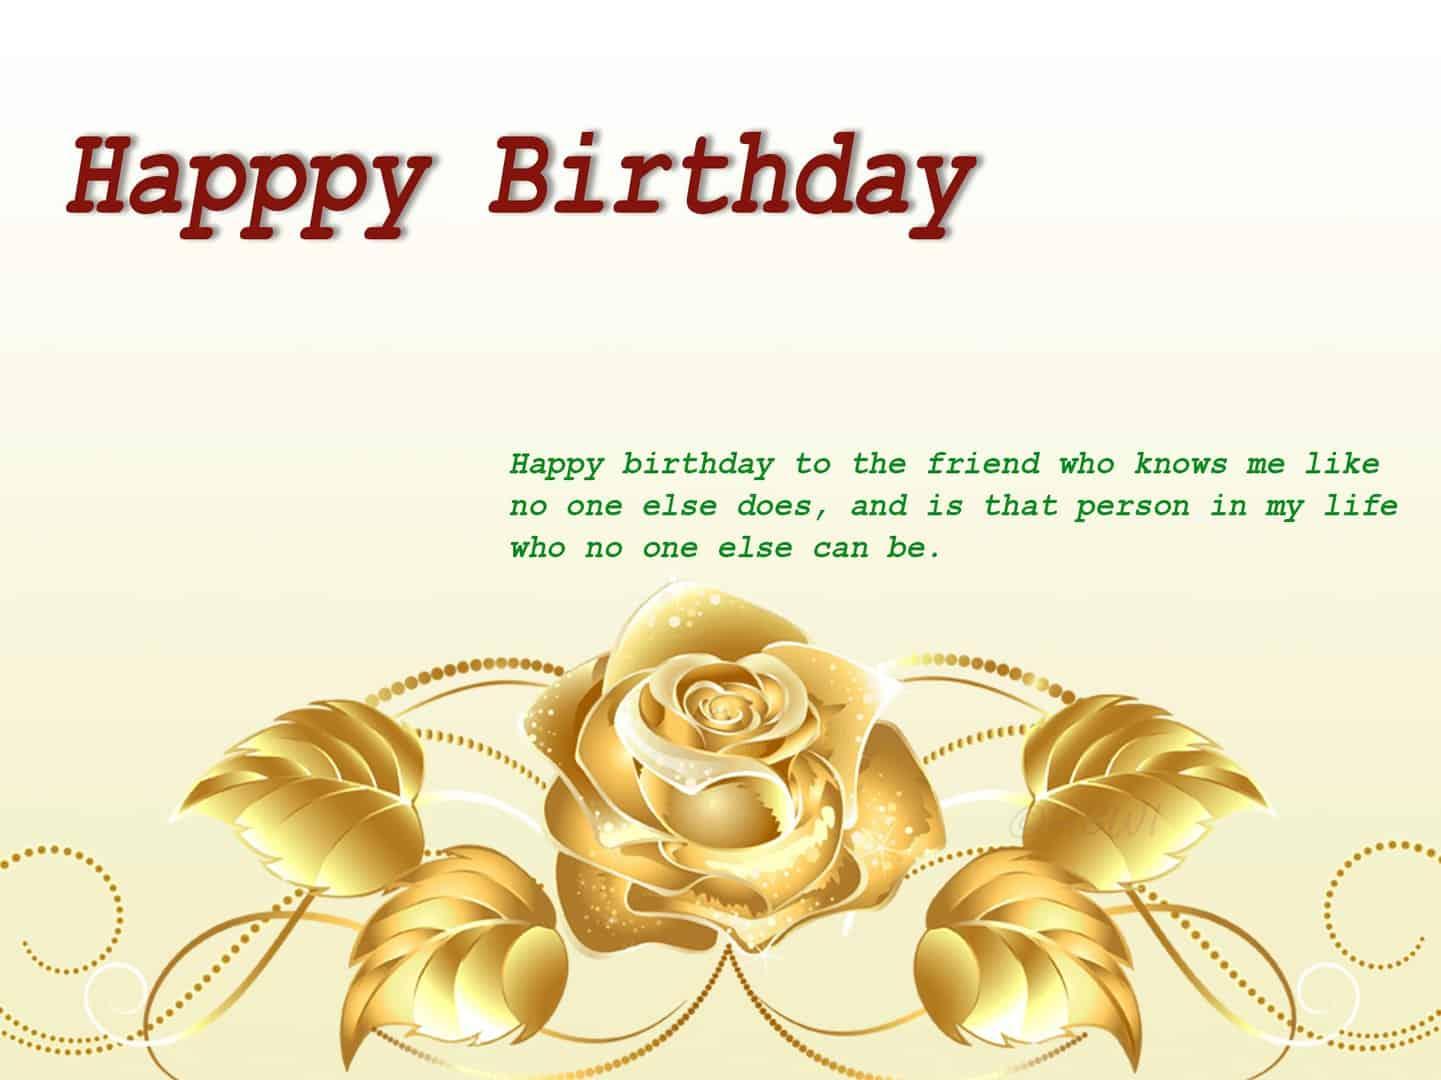 Golden Rose happy birthday image